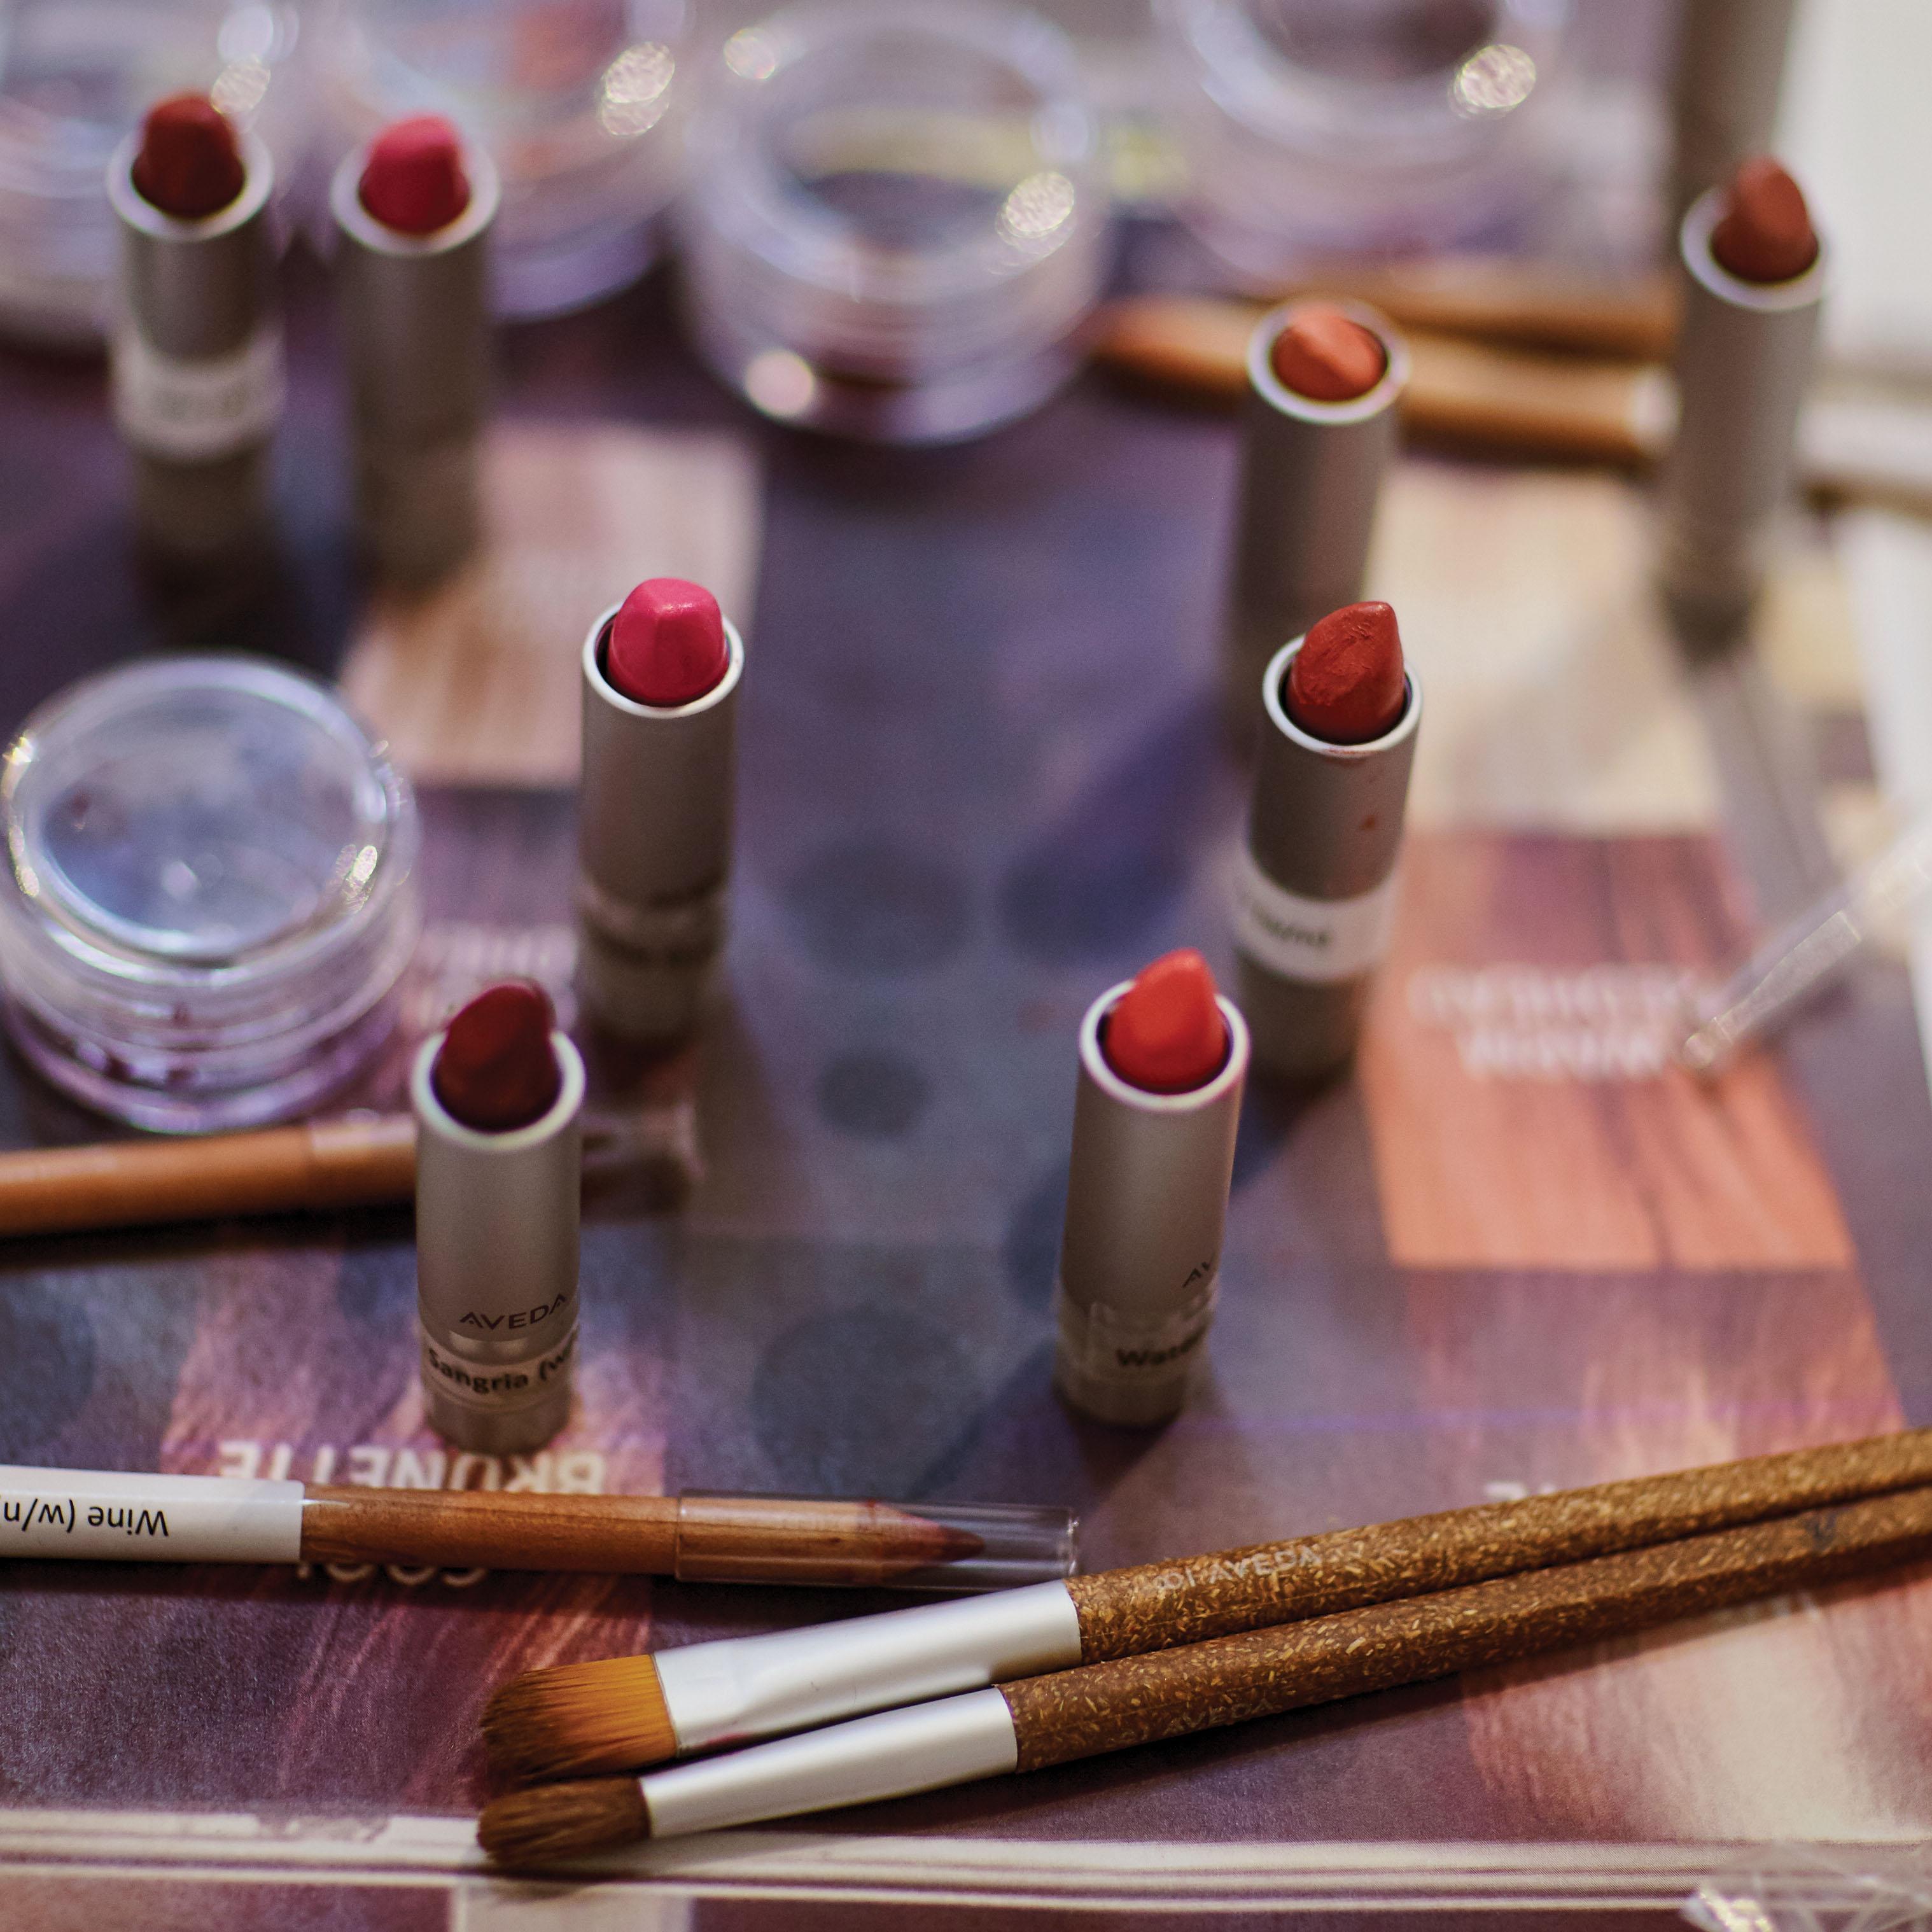 aveda-lipsticks-online